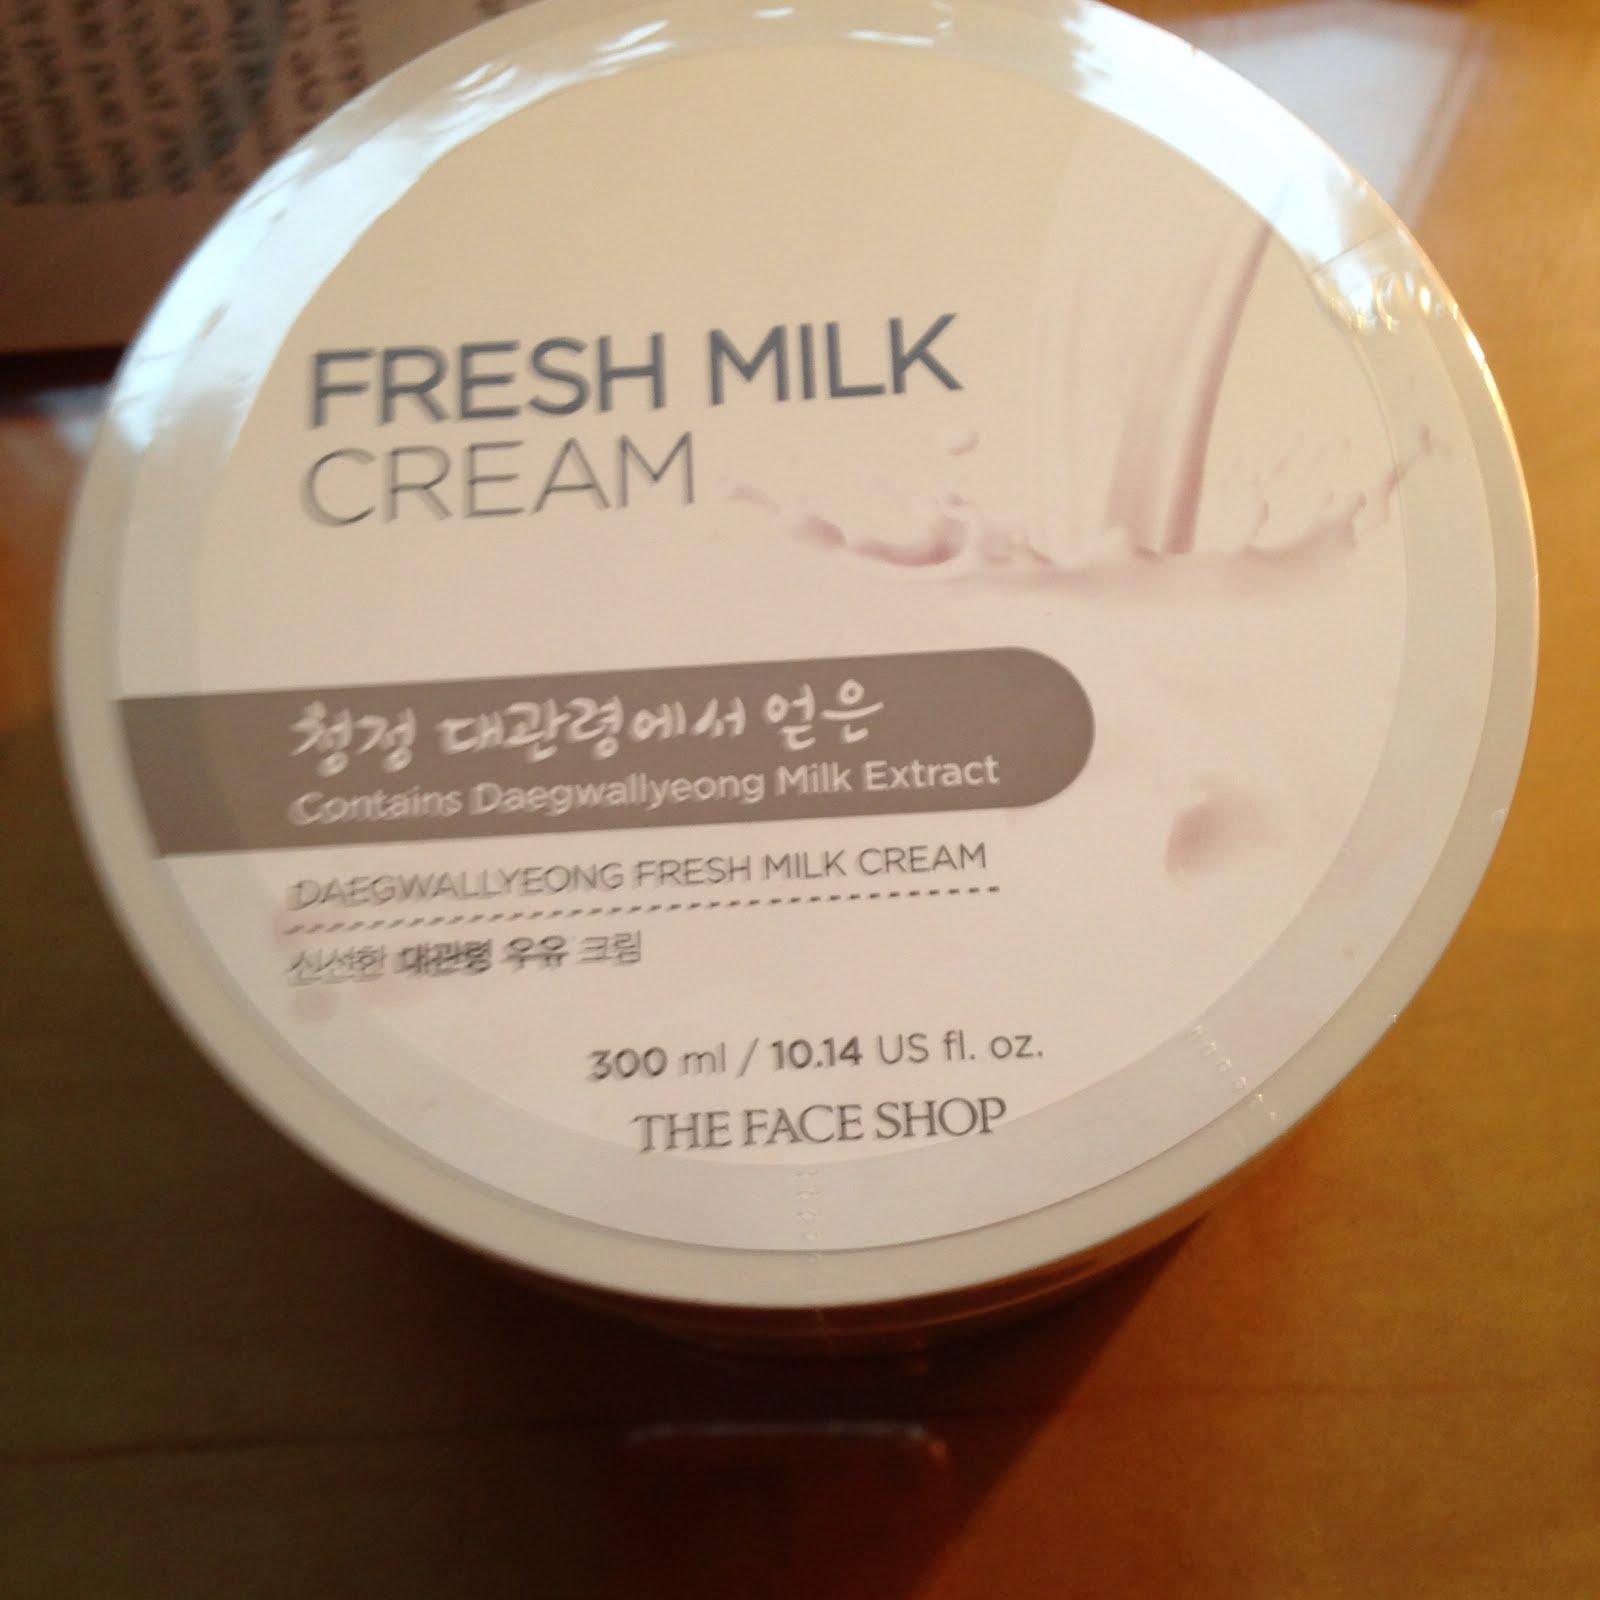 Fresh Milk Cream Face Shop Pantip